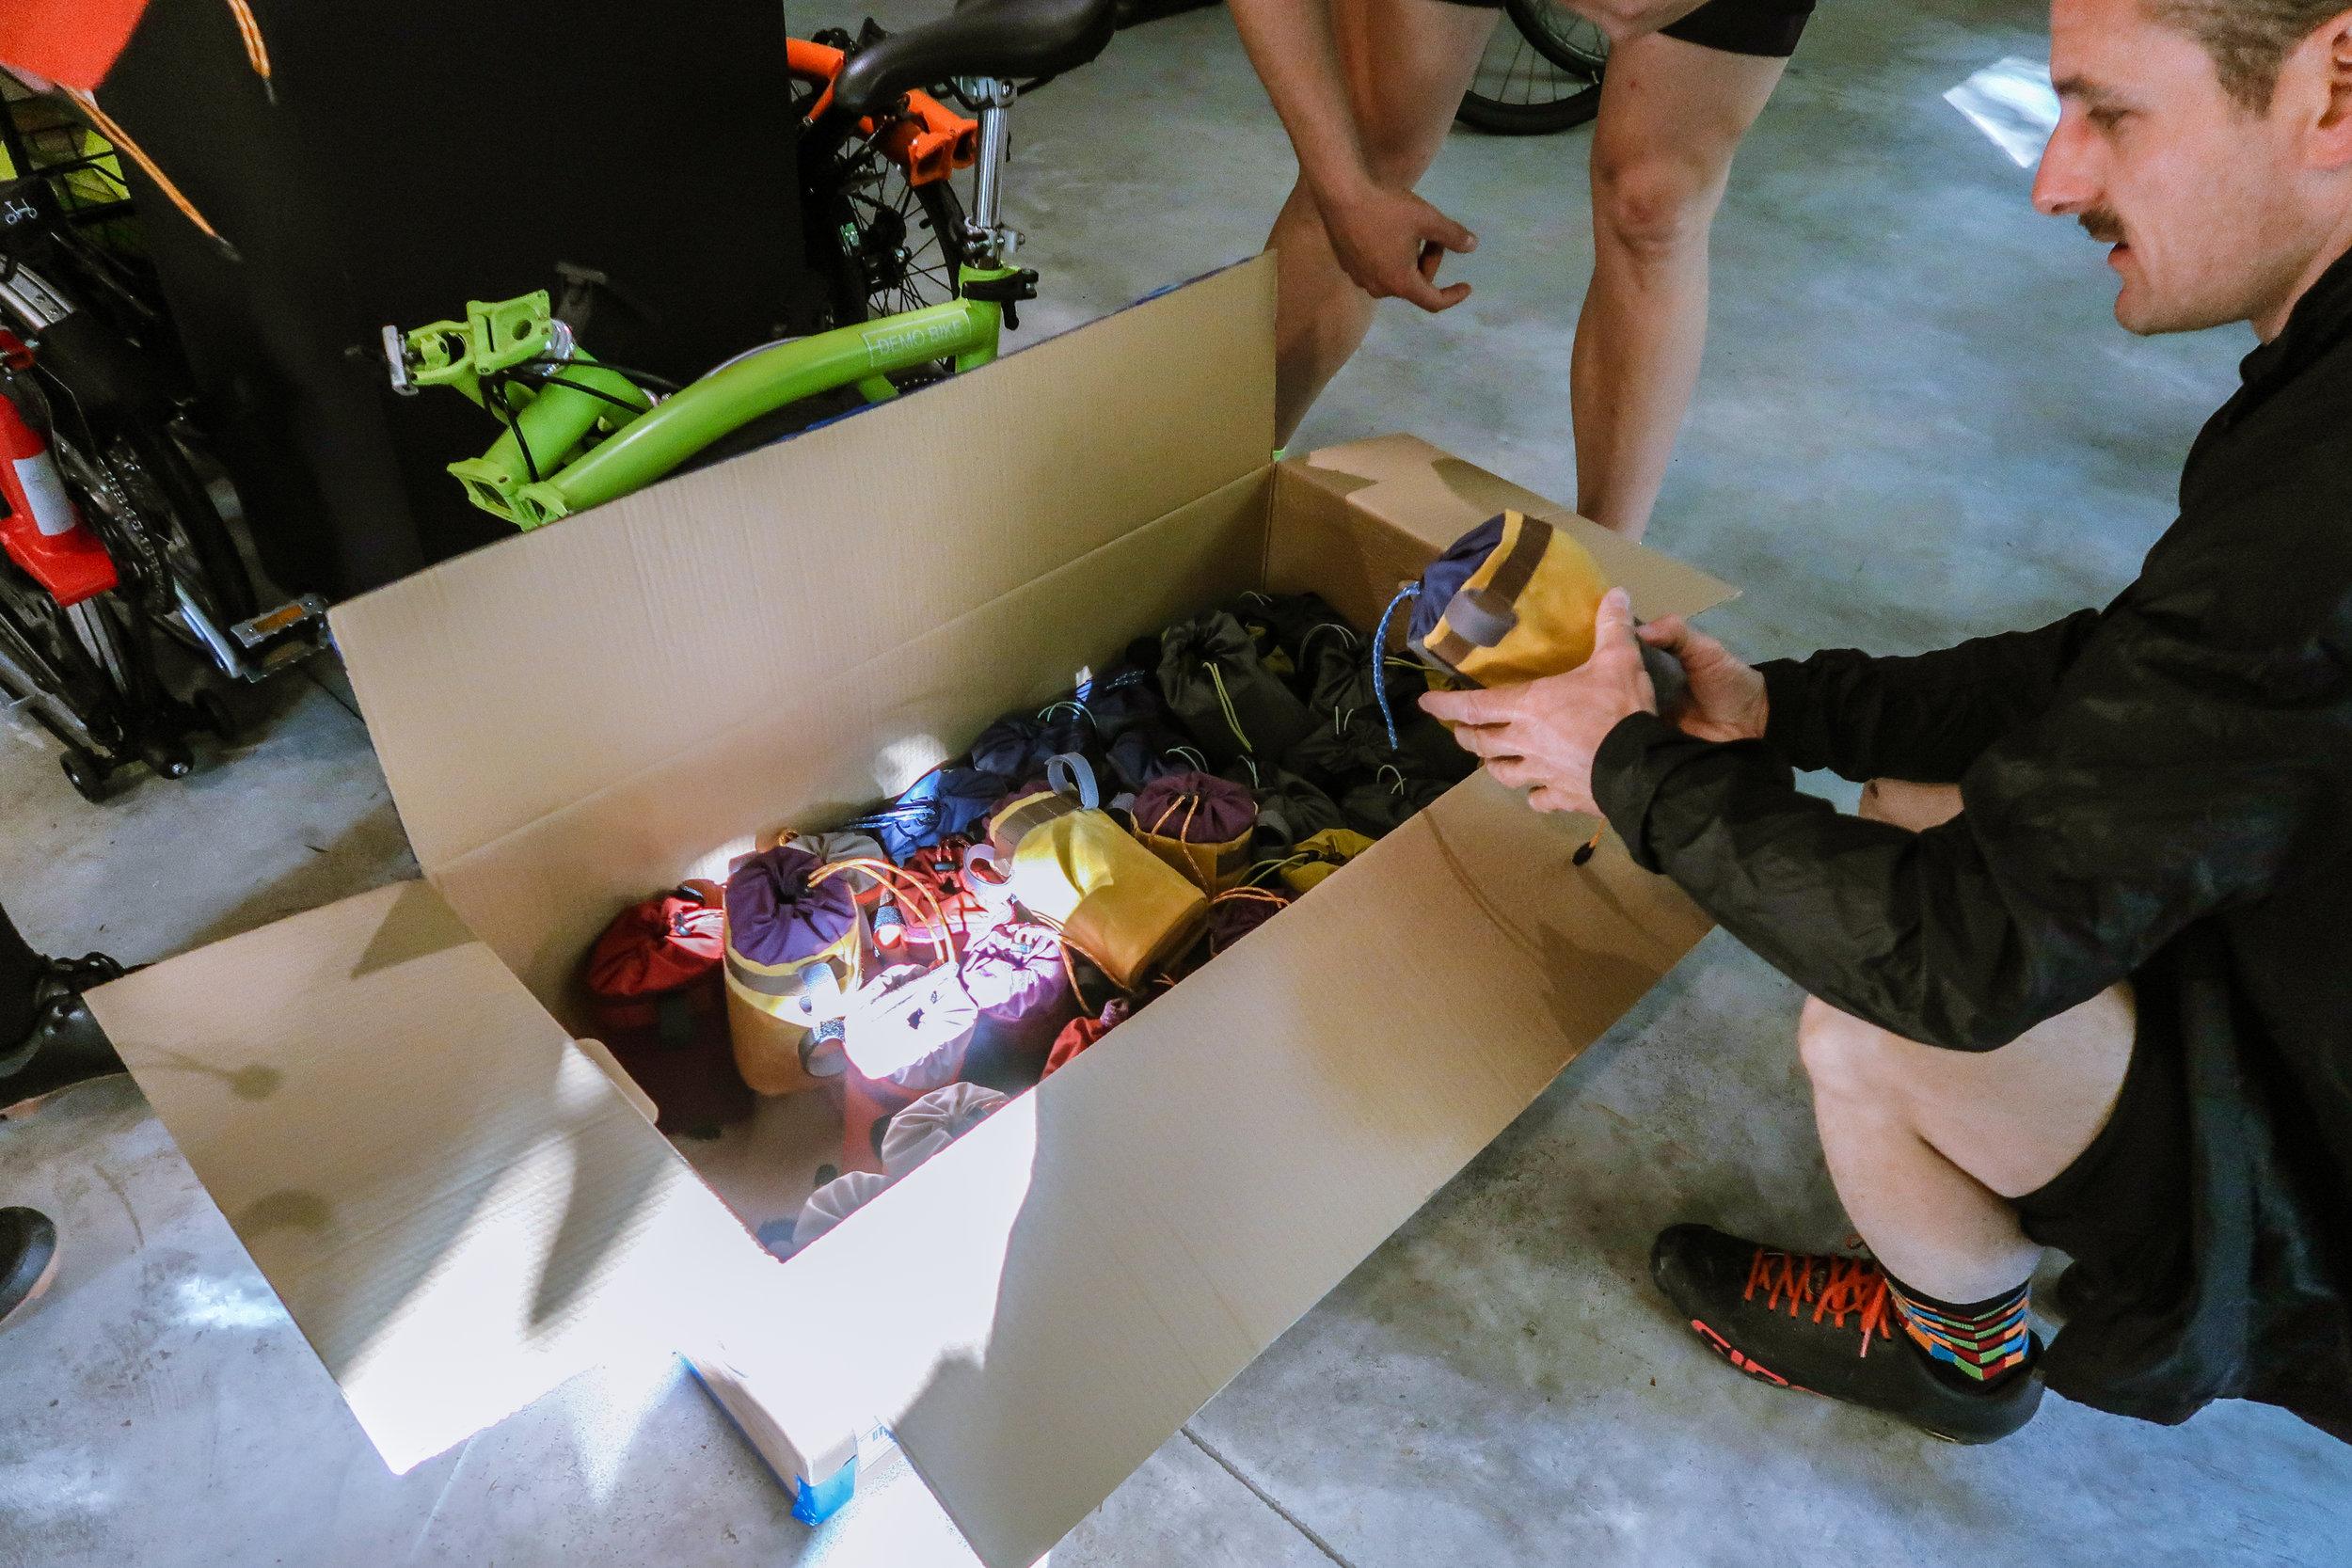 Each participant received a snack/handlebar bag, made especially for the event!